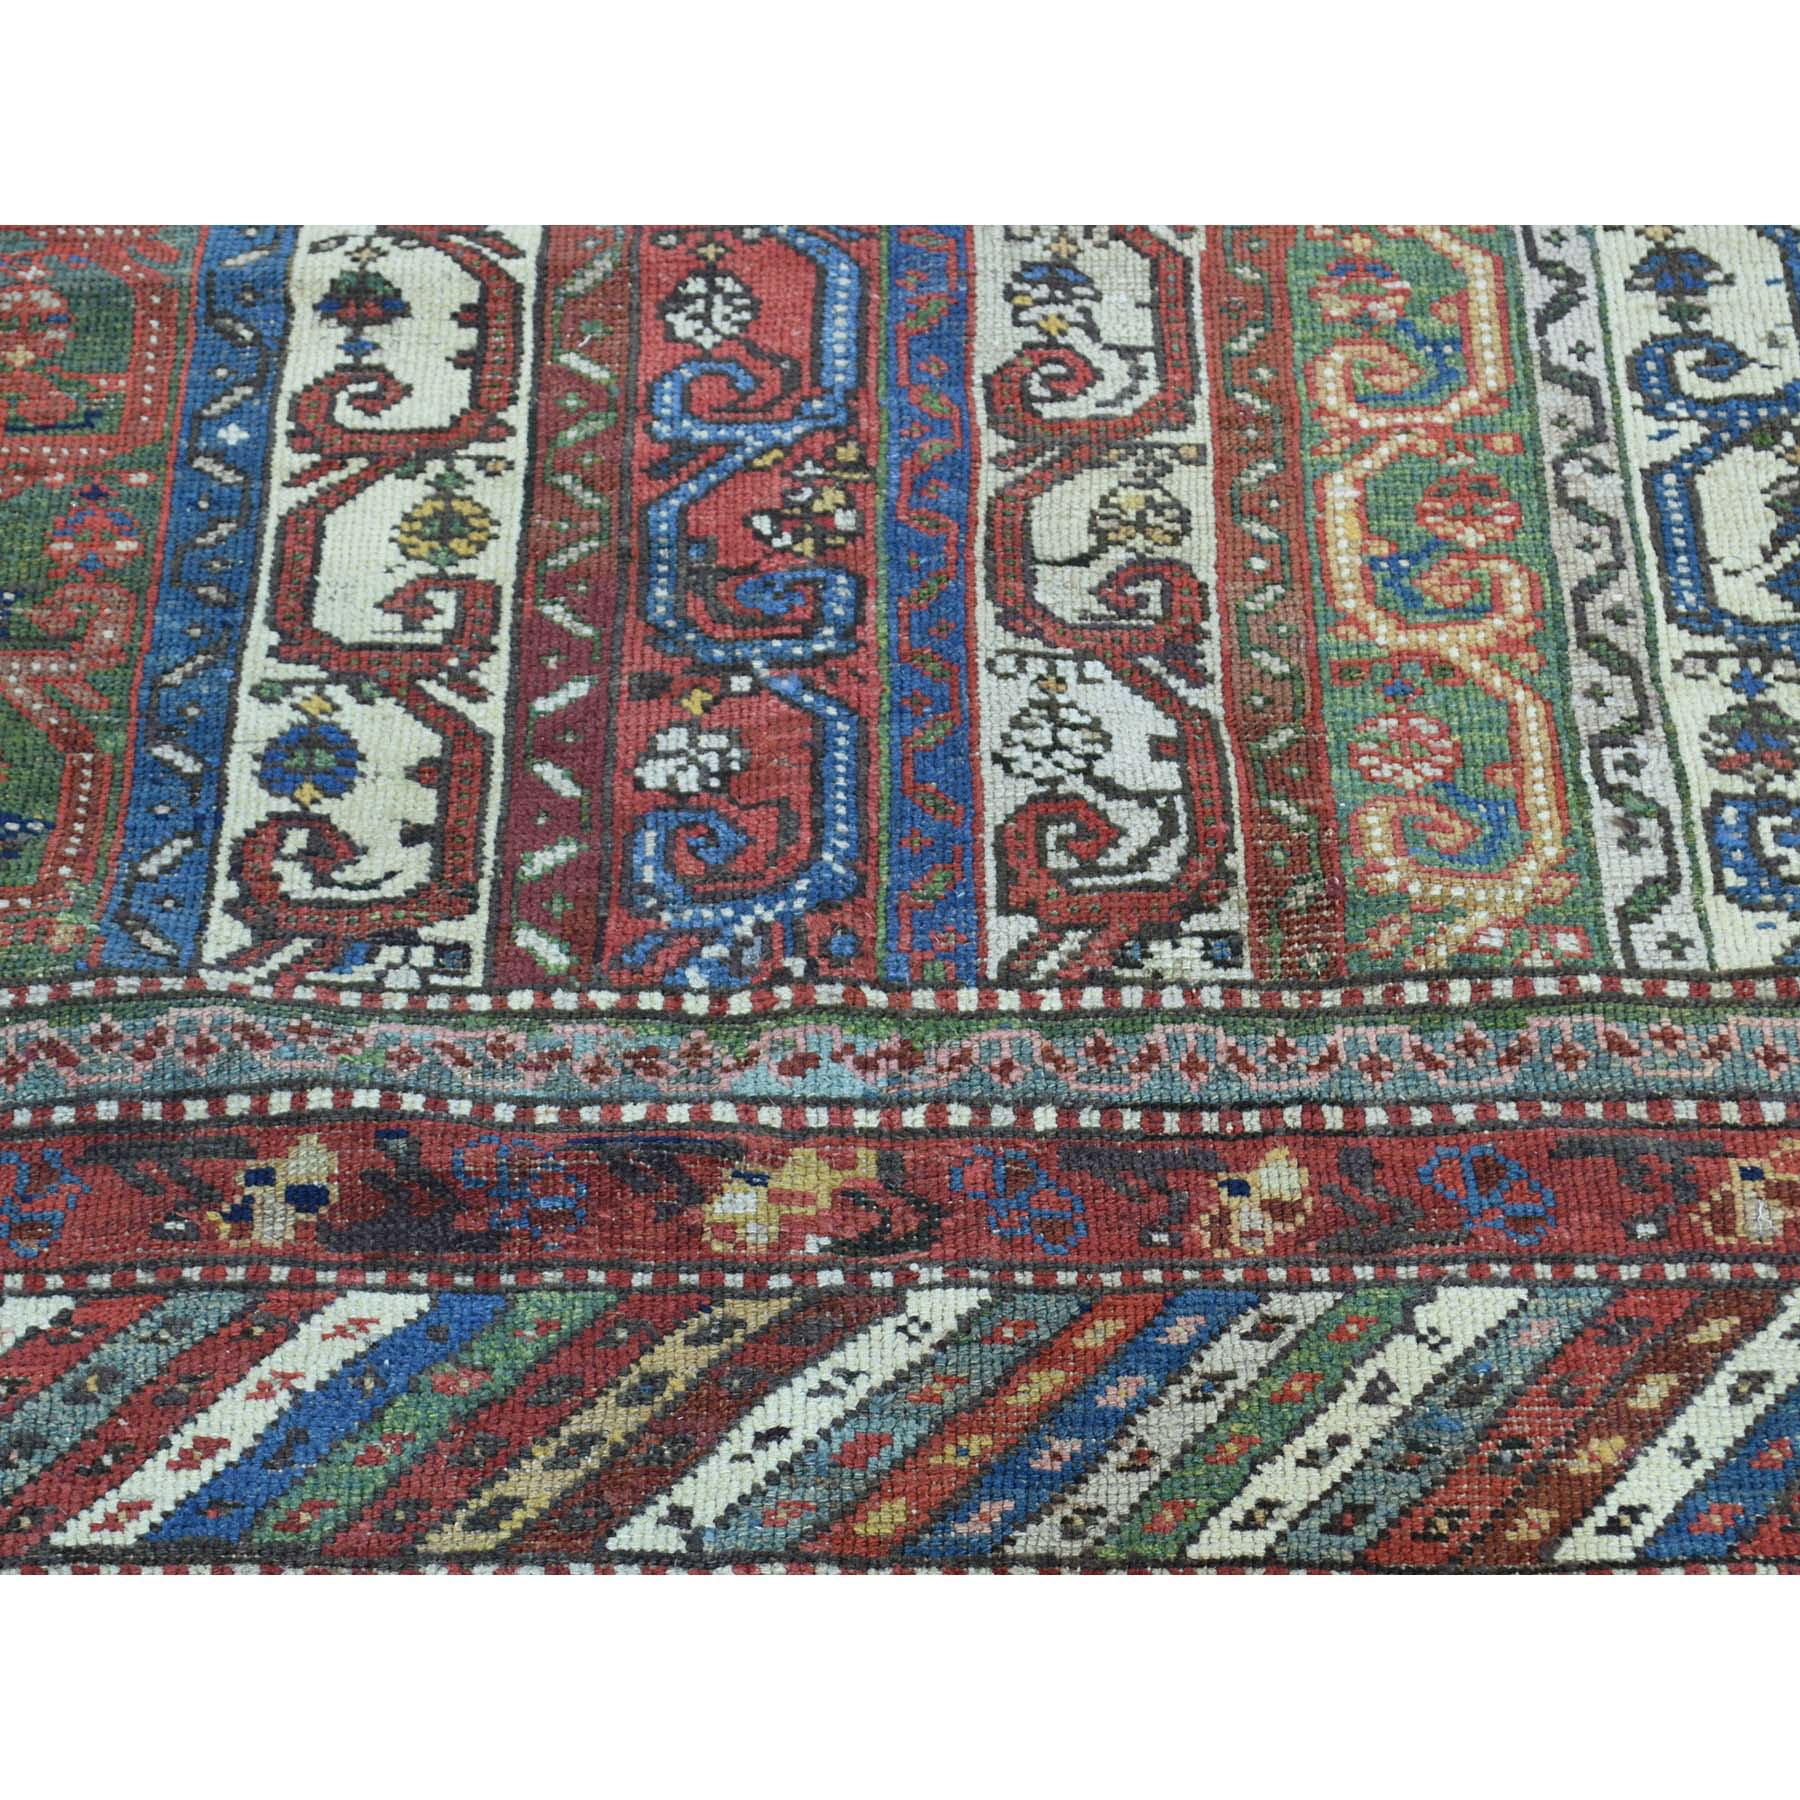 6-5 x15-6  Antique Northwest Persian With Shawl Design Wide Runner Rug